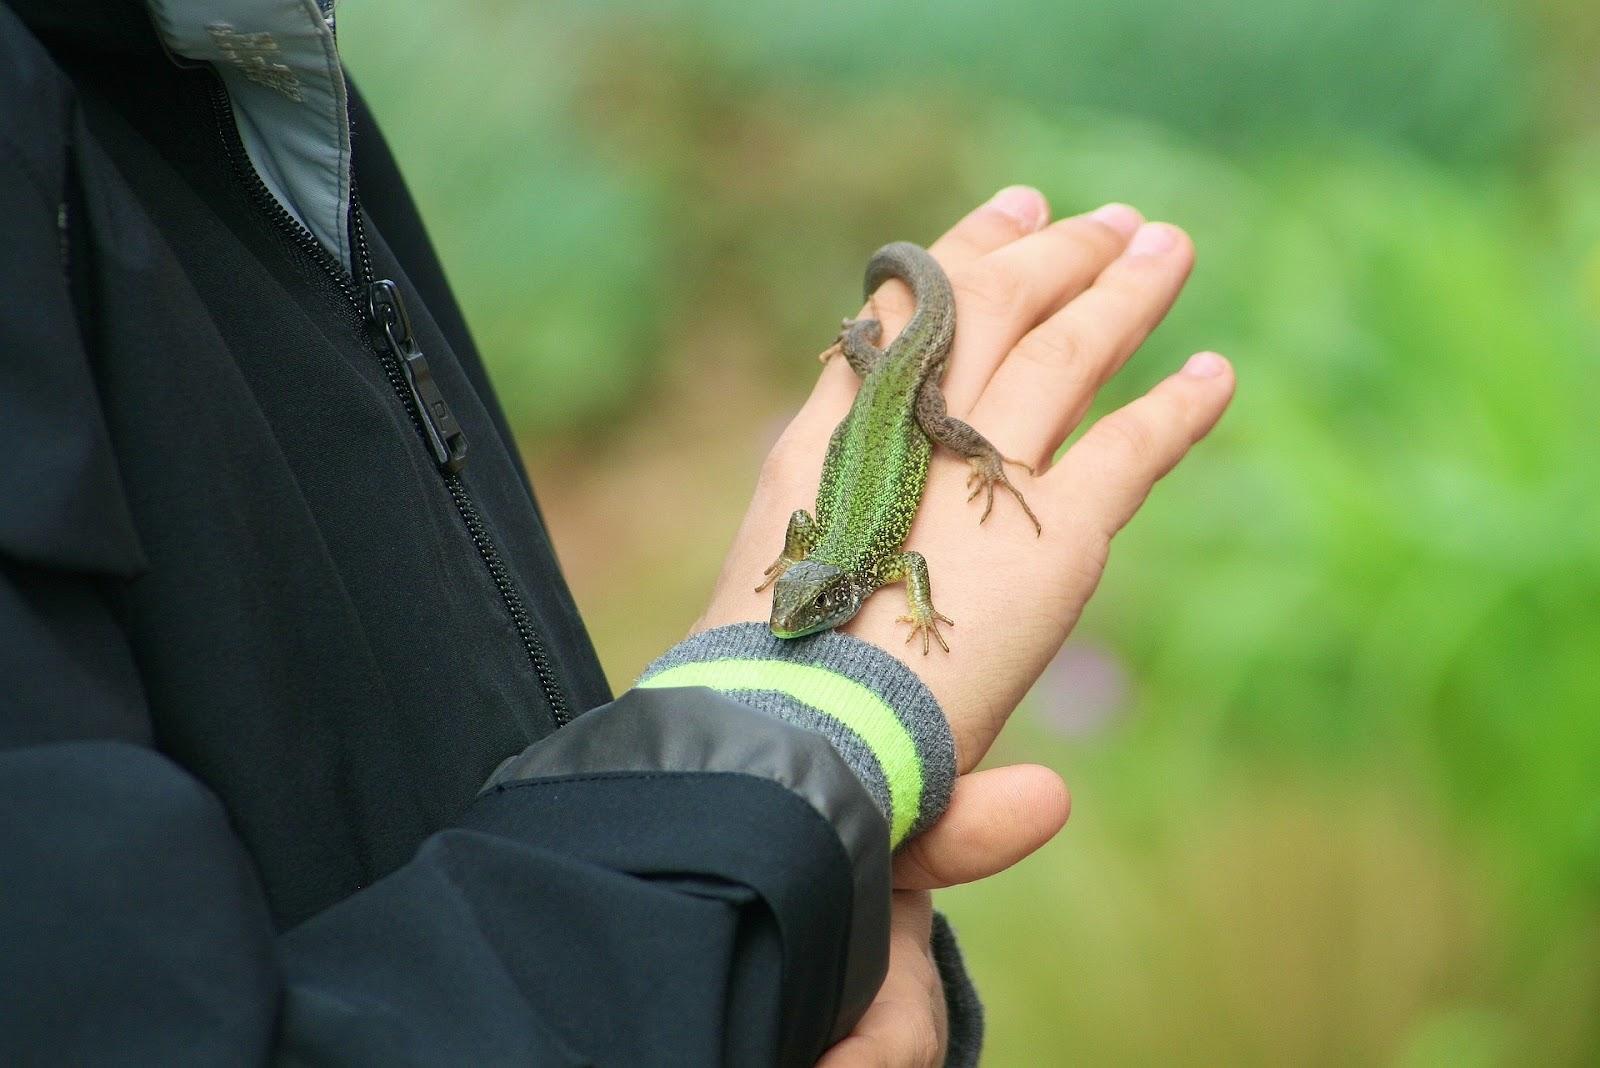 Kid with lizard on hand